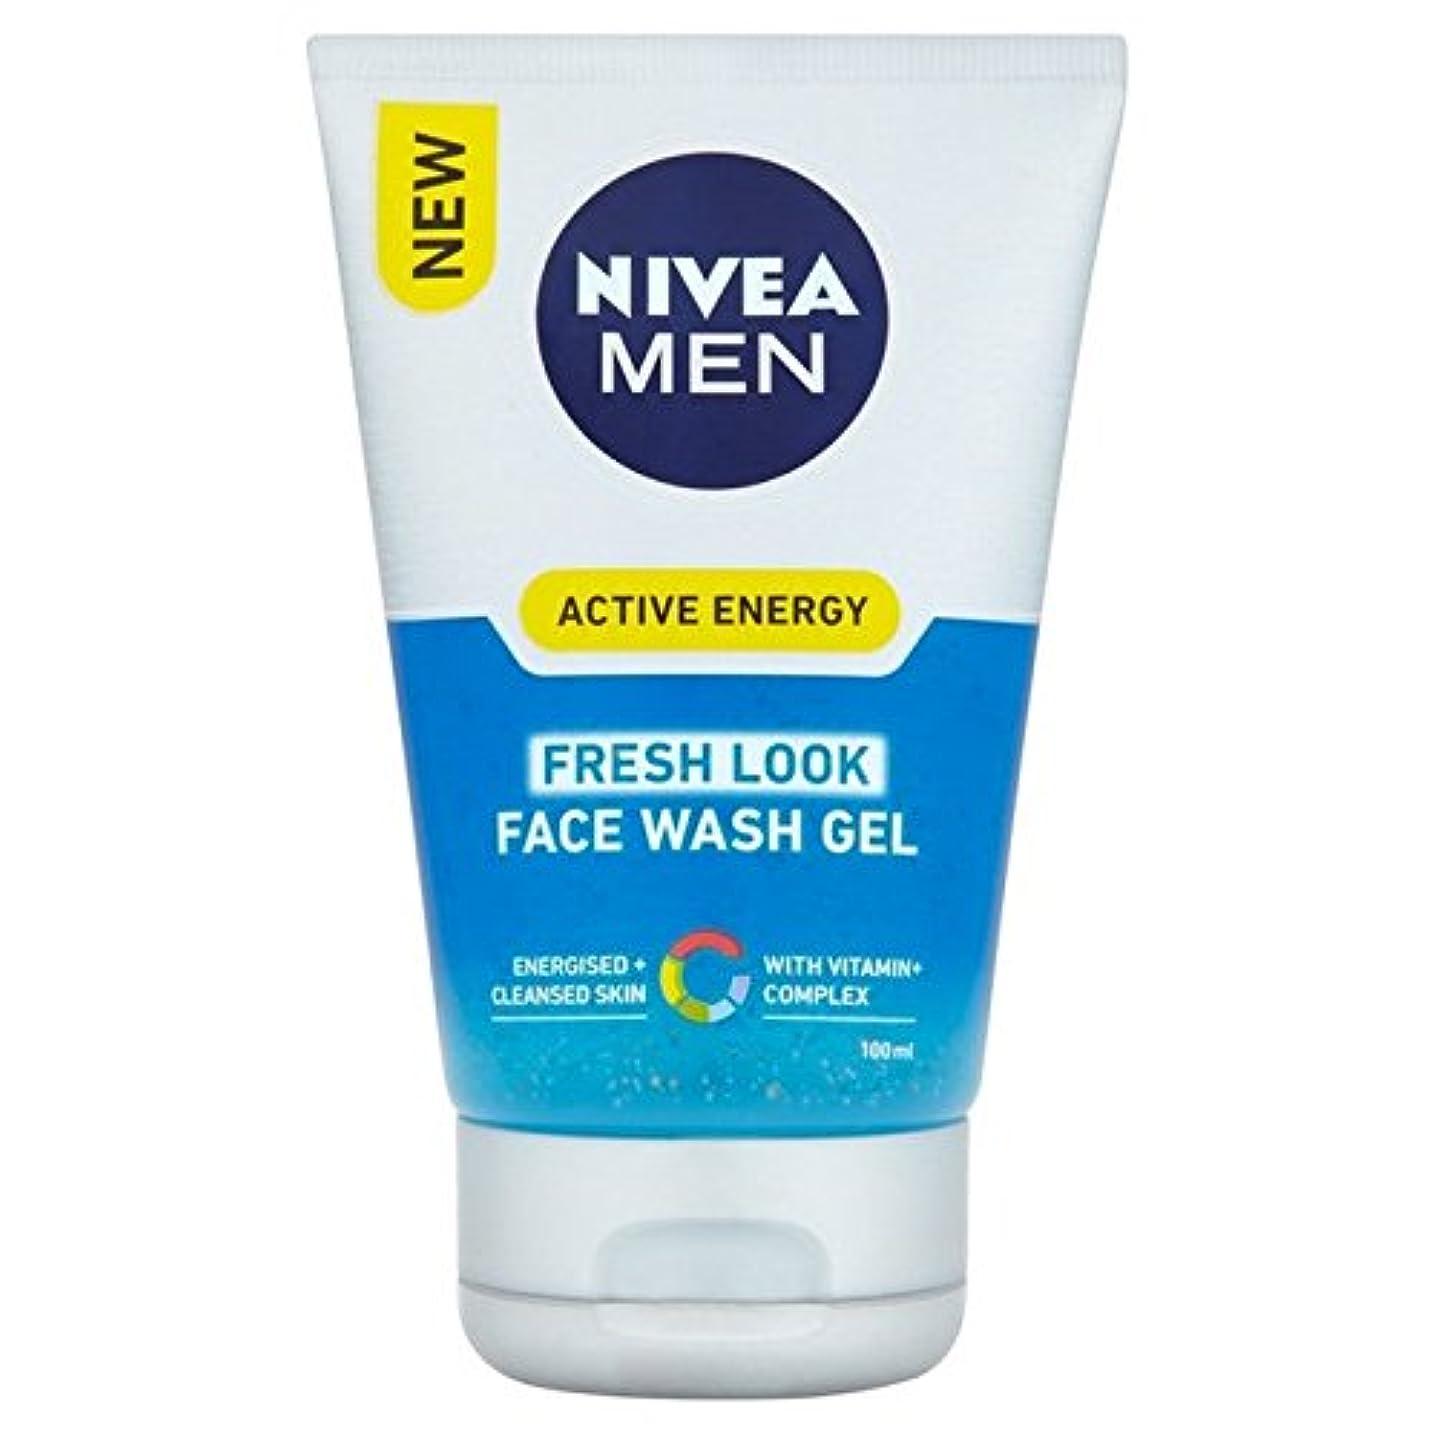 Nivea Men Q10 Face Wash 100ml (Pack of 6) - ニベア男性10フェイスウォッシュ100ミリリットル x6 [並行輸入品]